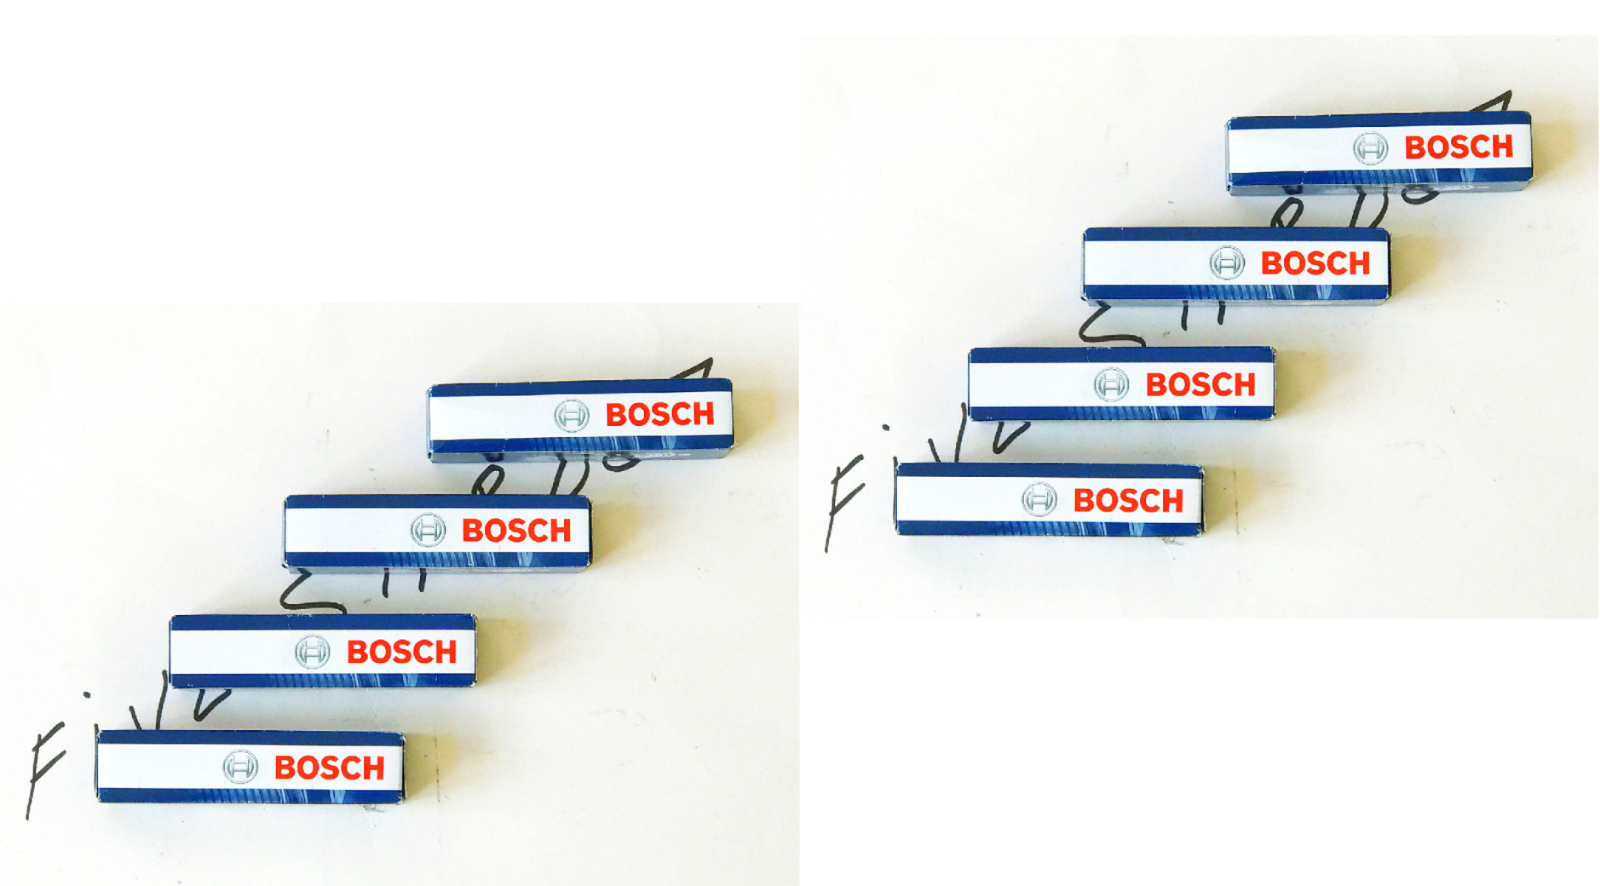 8 BOSCH Ignition Coil Pack Set 8 Spark Plug Kit for BMW 2004-2010 x5 4.8i 4.8is